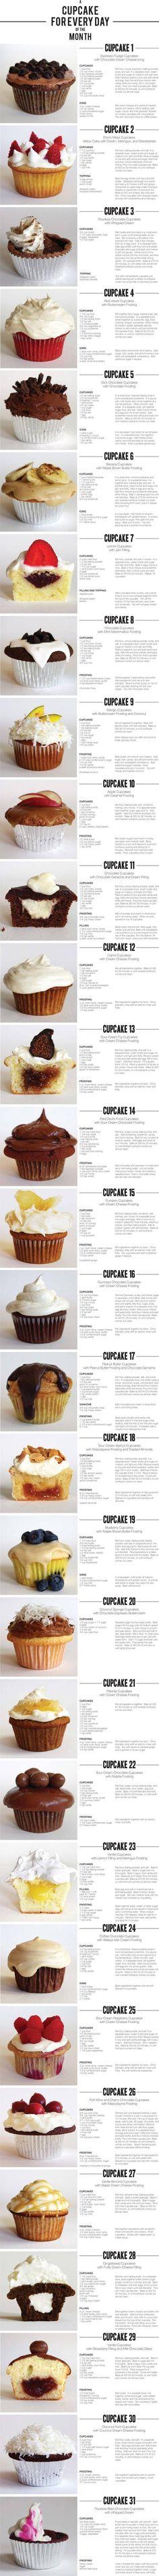 31-cupcakes